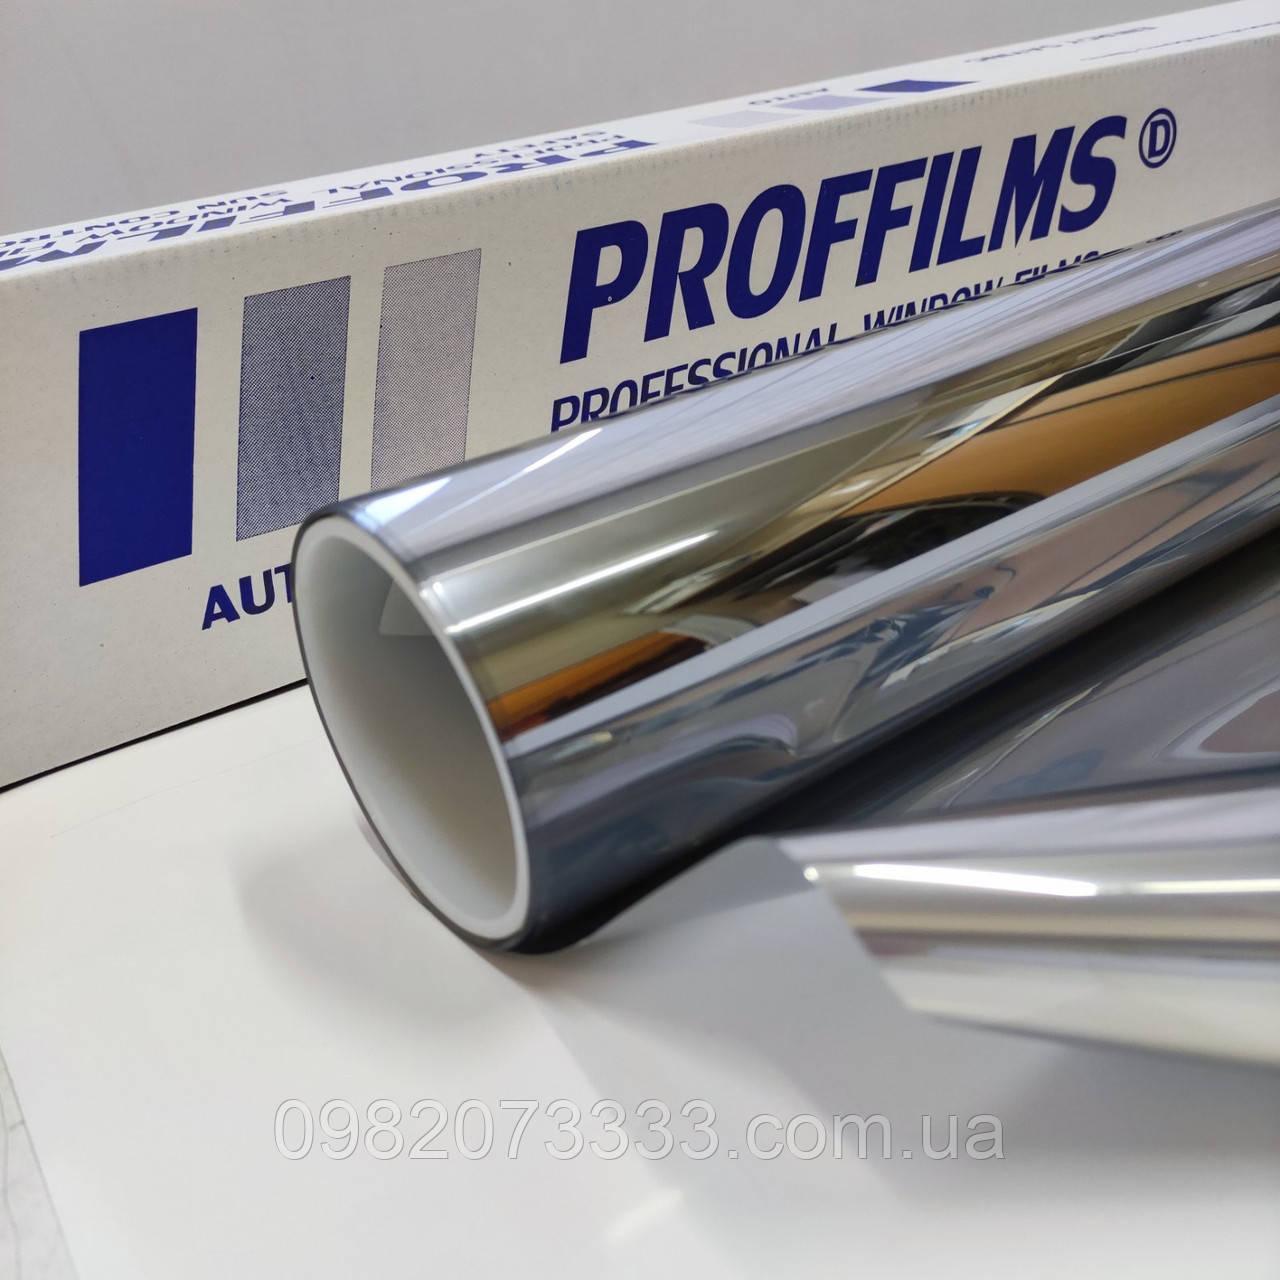 Солнцезащитная плёнка PROFFILMS Silver 20 зеркальная для тонировки окон ширина рулона 1,830 цена за кв.м.